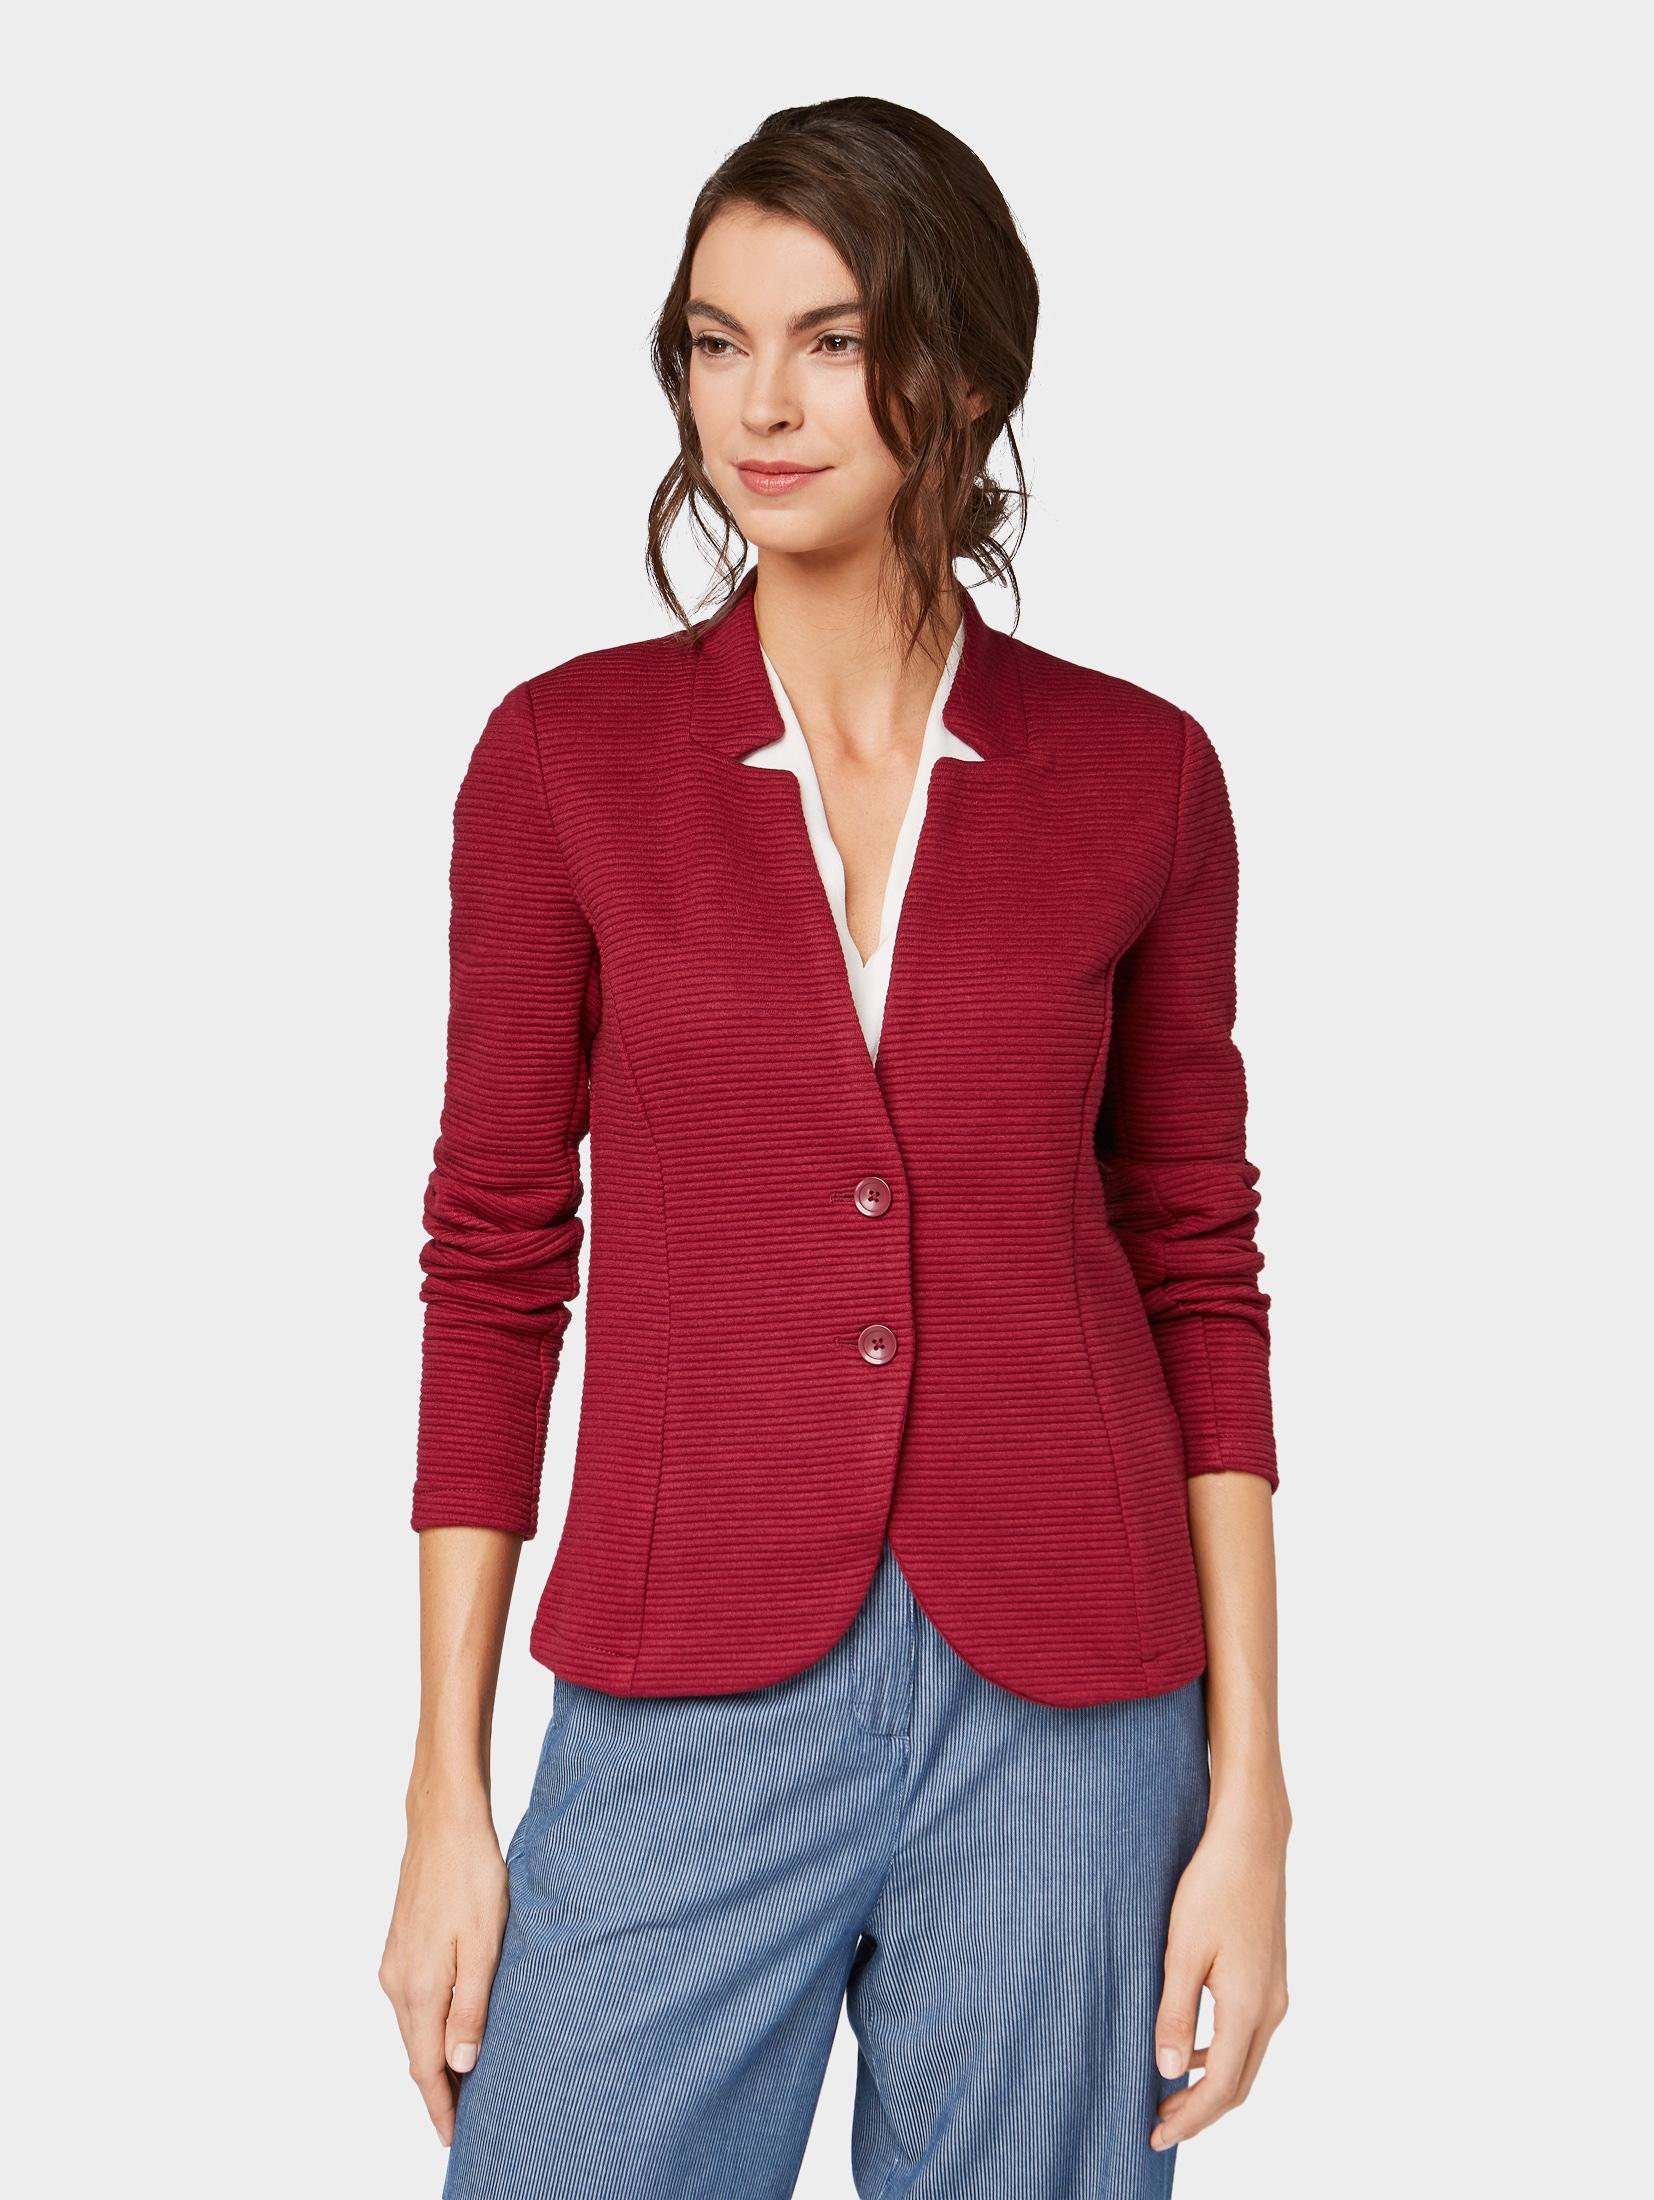 TOM TAILOR Jackenblazer Blazer mit Strukturmuster   Bekleidung > Blazer > Jackenblazer   Tom Tailor